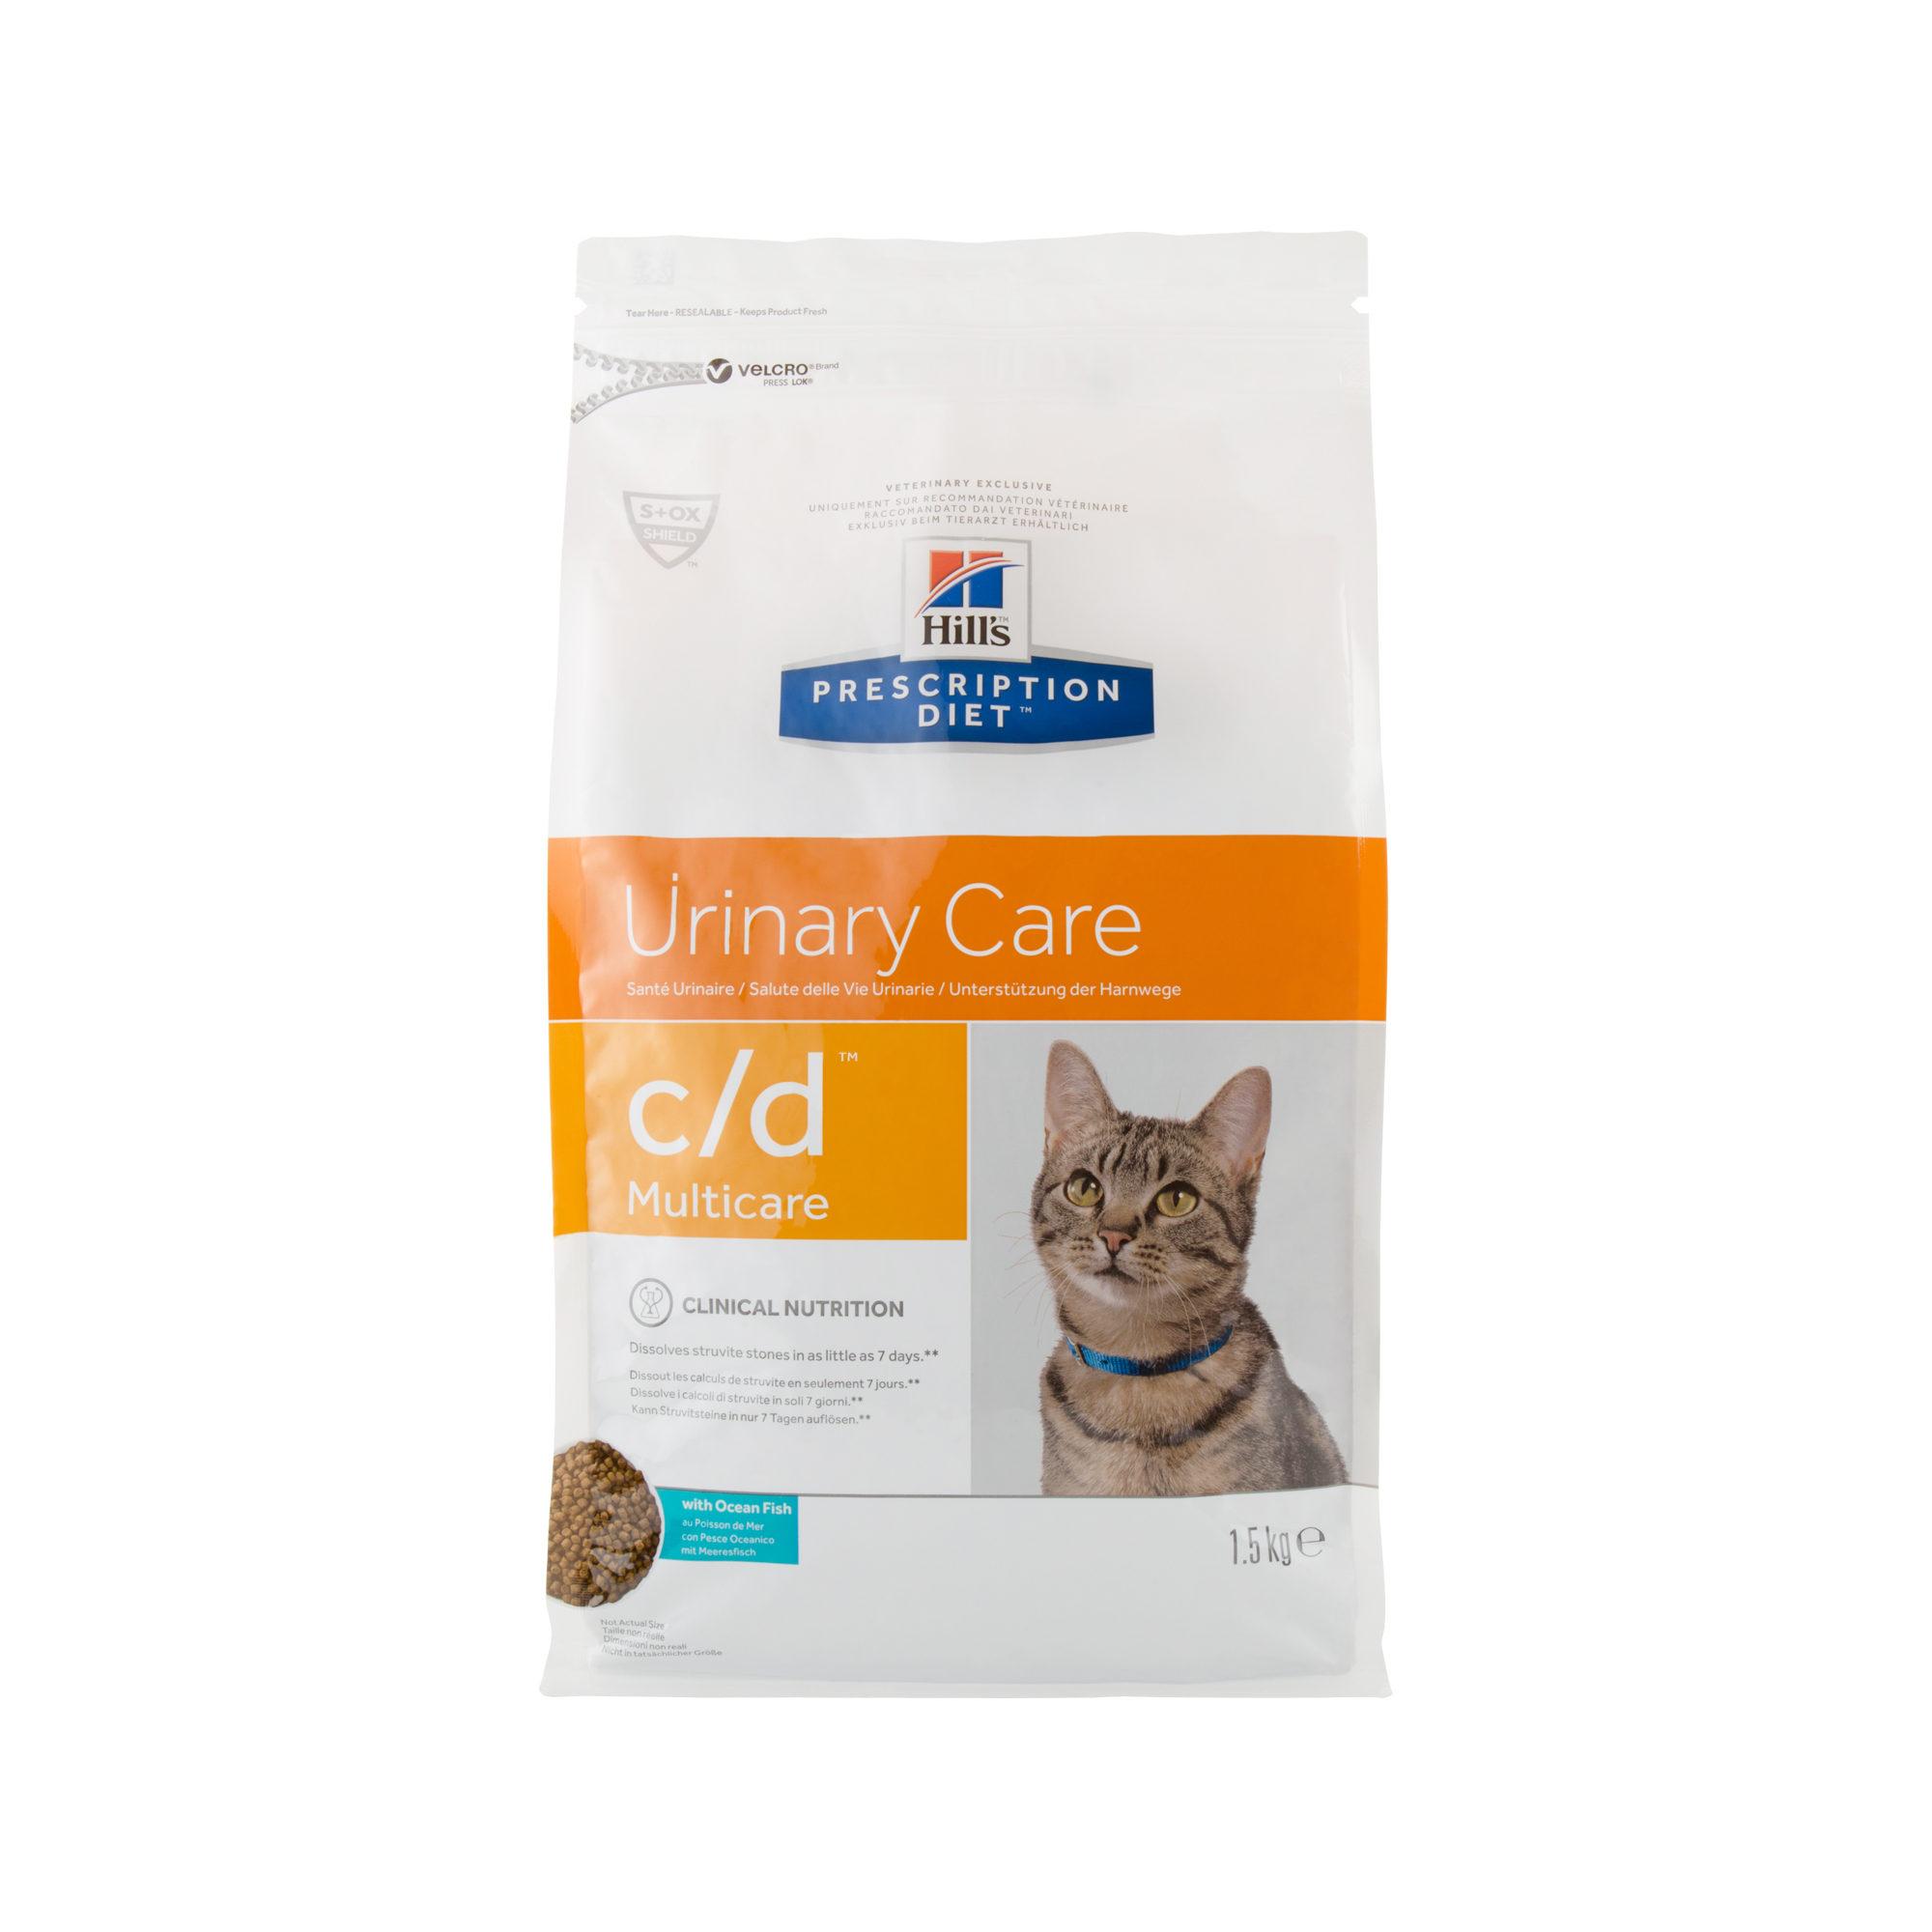 Hill's Prescription Diet c/d Multicare Katzenfutter - Meeresfisch